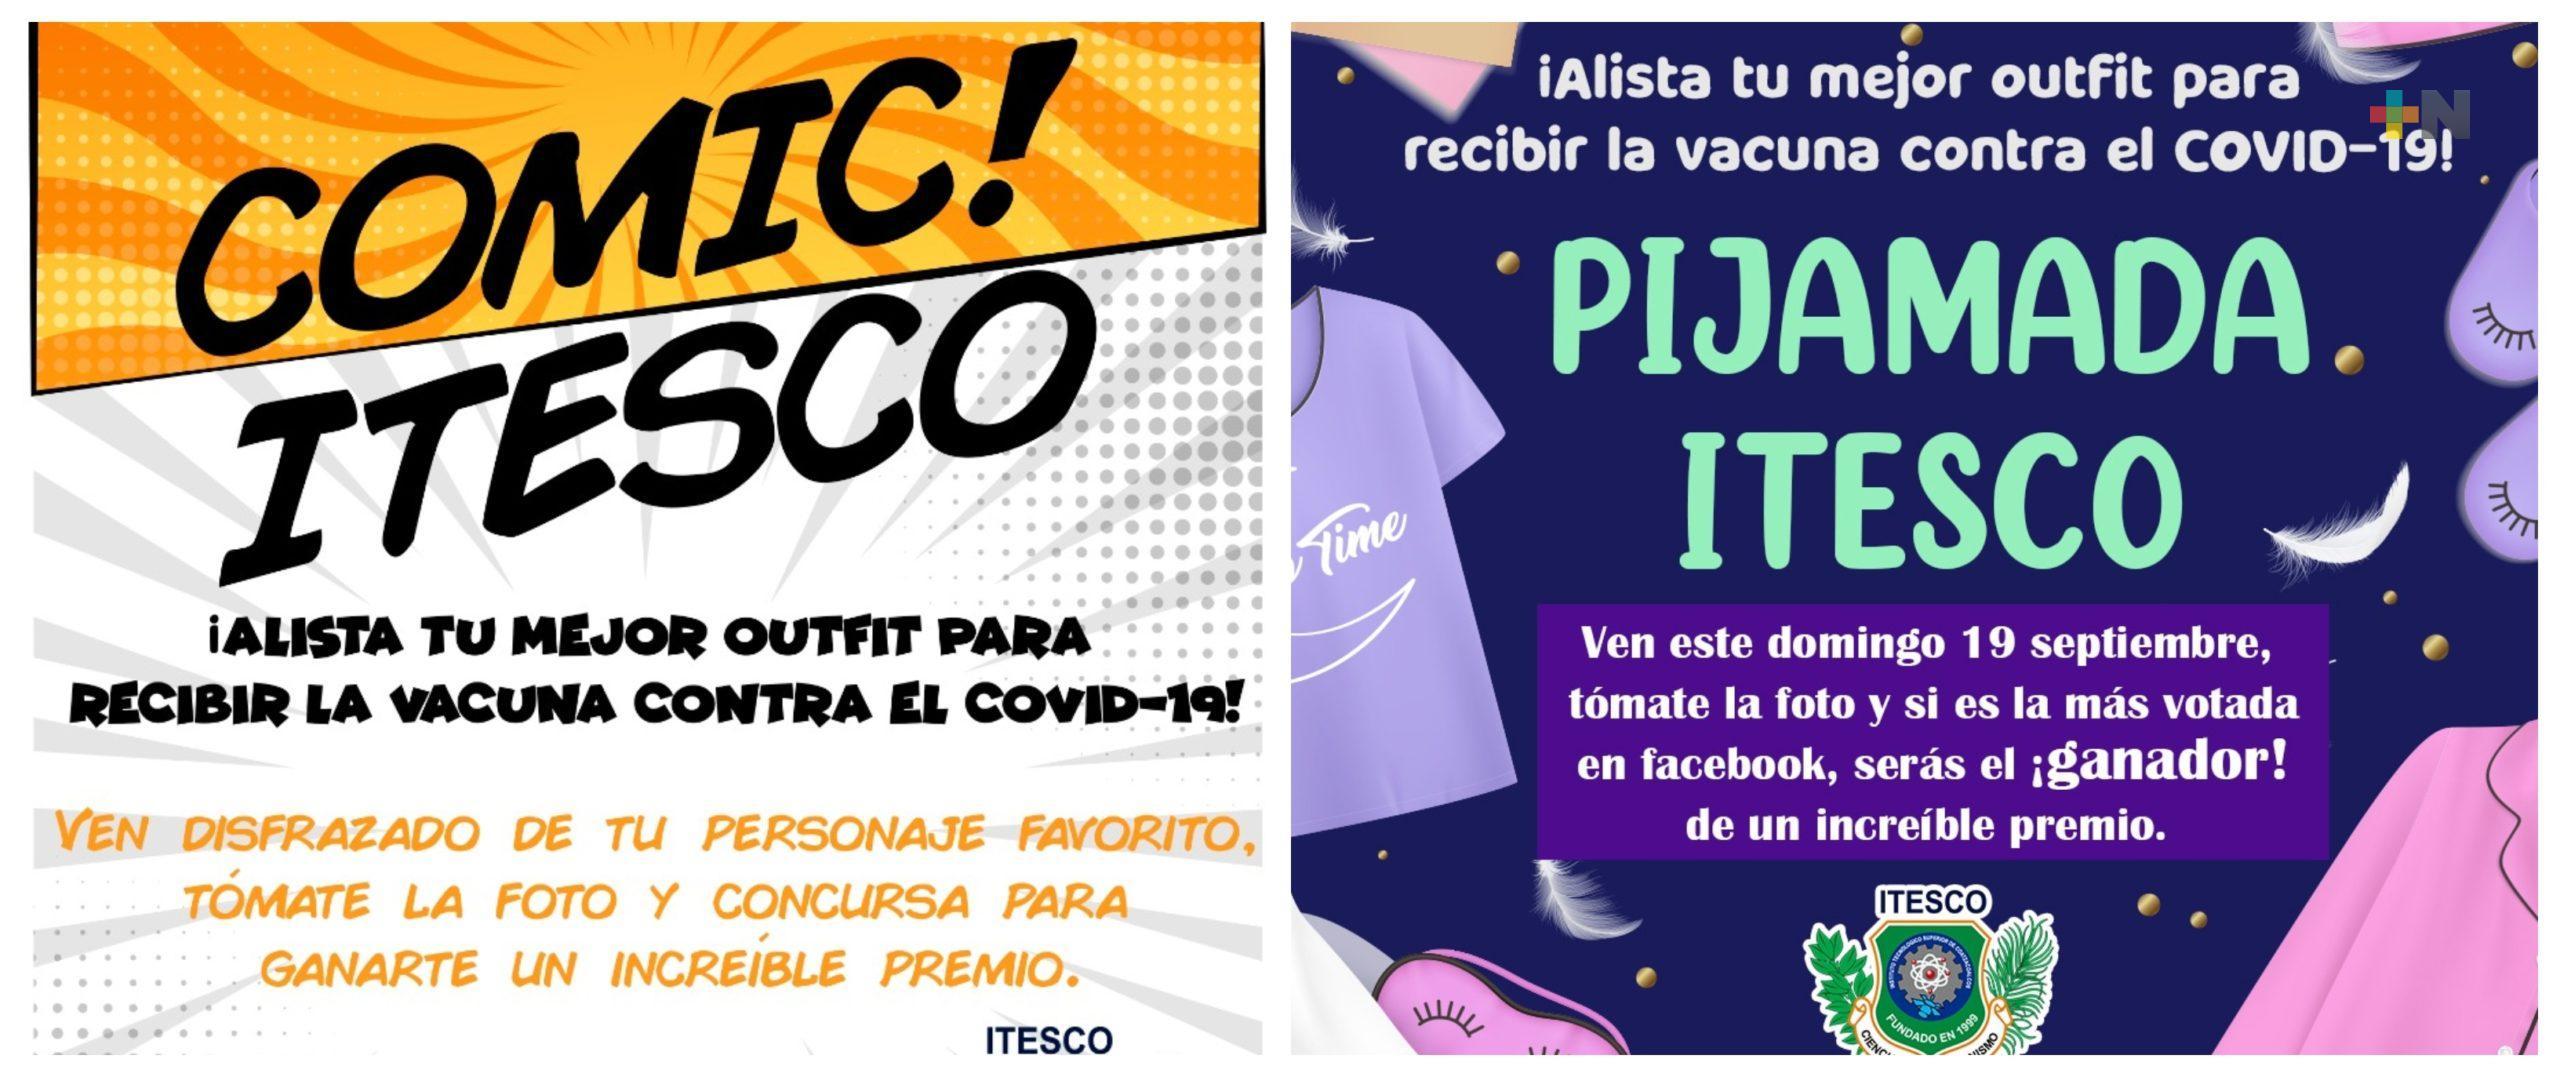 En Coatza, Itesco convocan a jóvenes acudir en pijama o disfraz de cómic a recibir vacuna